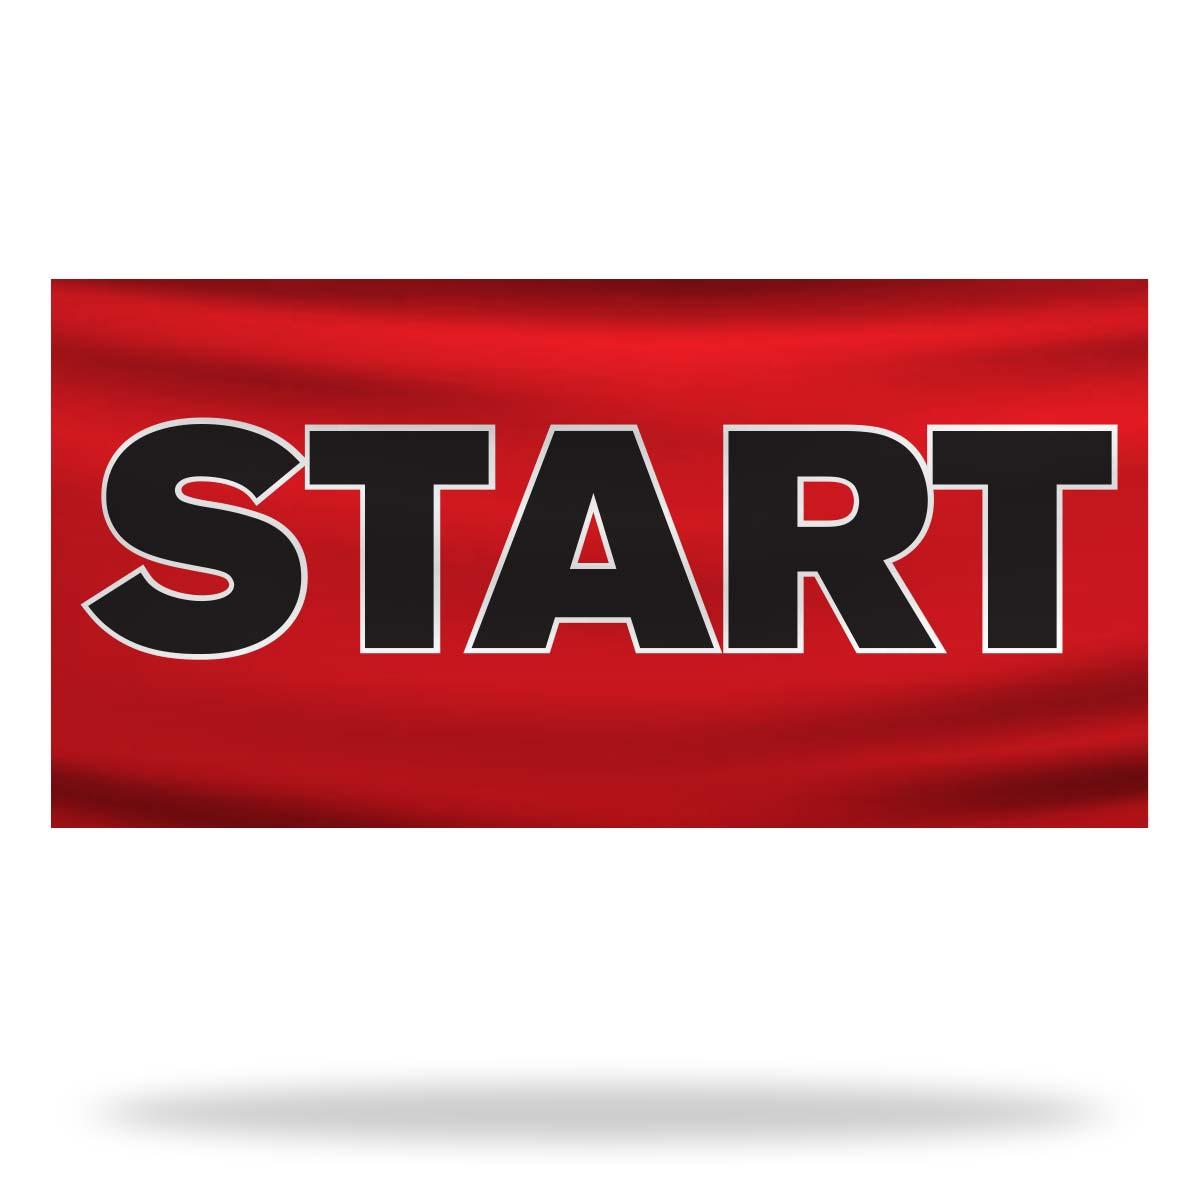 Start Flags & Banners Design 02